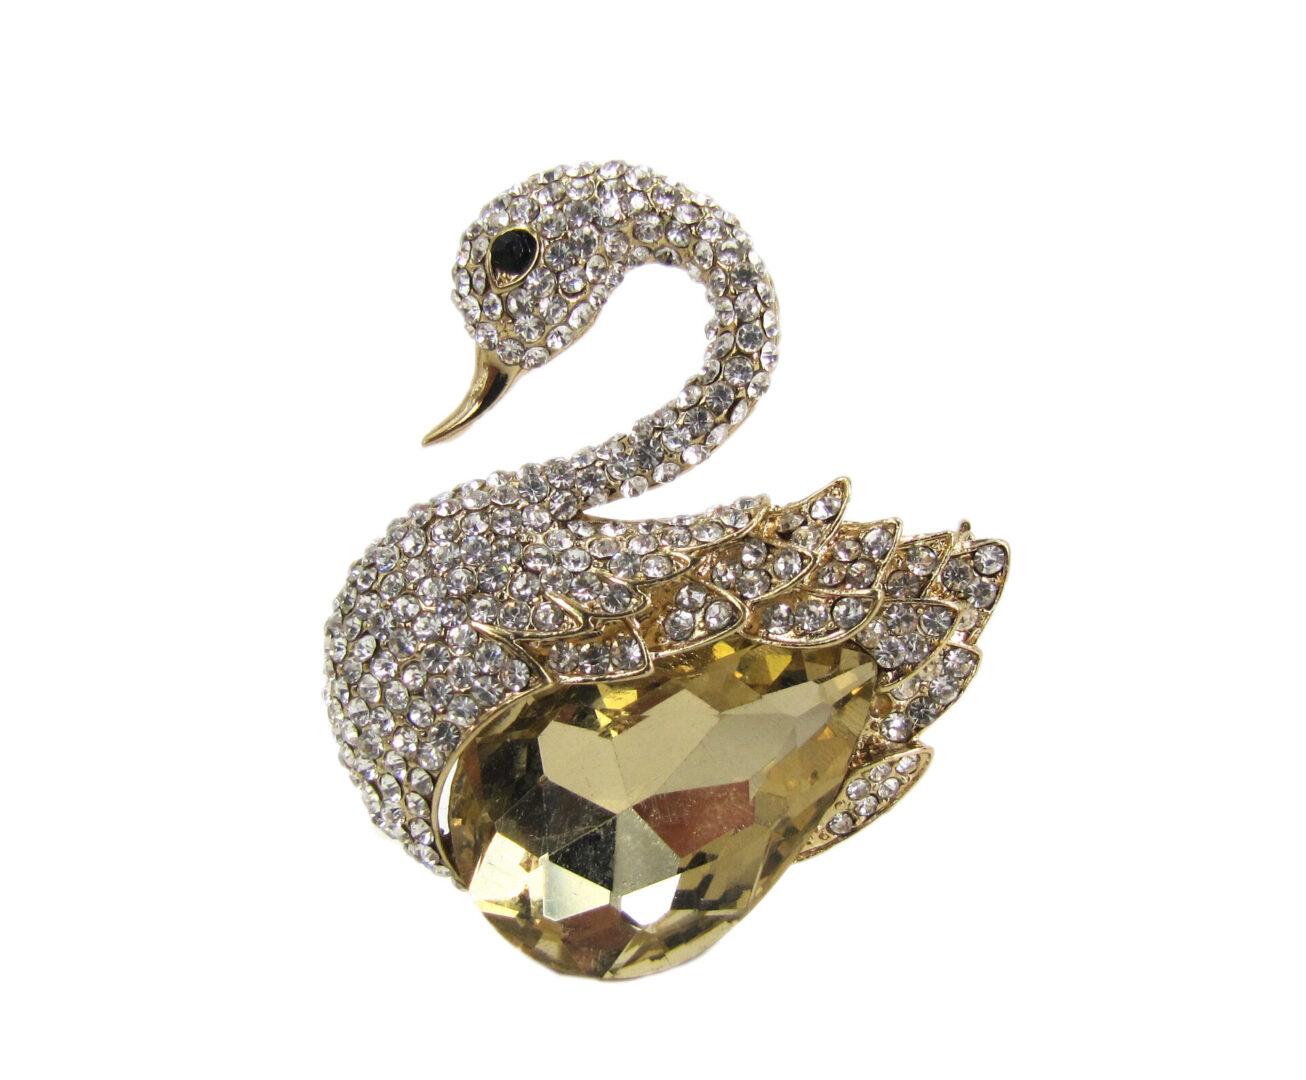 swan brooch with large brown topaz crystal